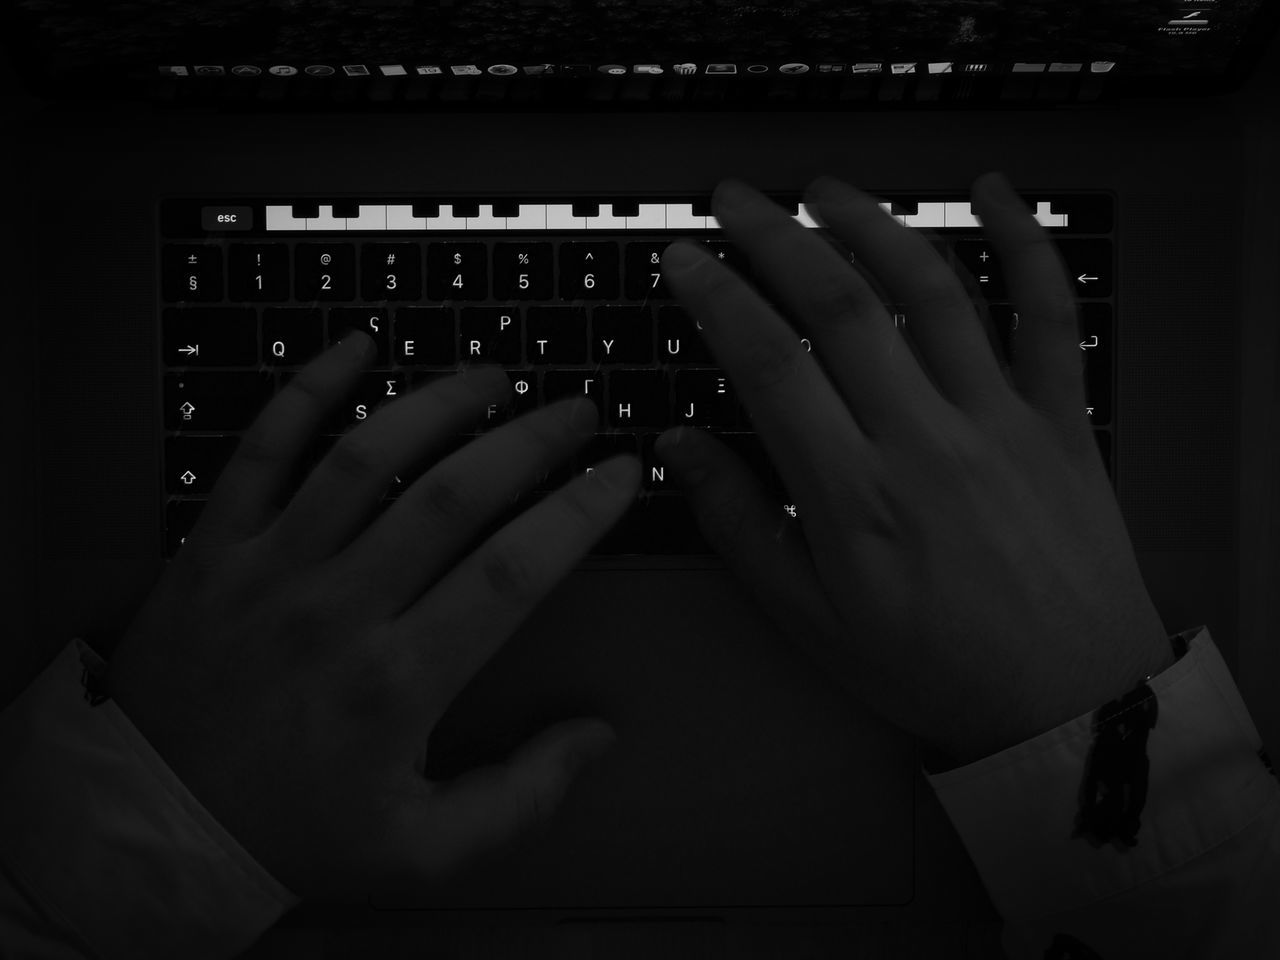 App Black Black And White Brake Fingers Having Fun Human Hand Indoors  Keyboard Keyboard Instrument Laptop Lowlight Music Piano Piano Moments Shirt Sleeve  Technology EyeEmNewHere Flying High